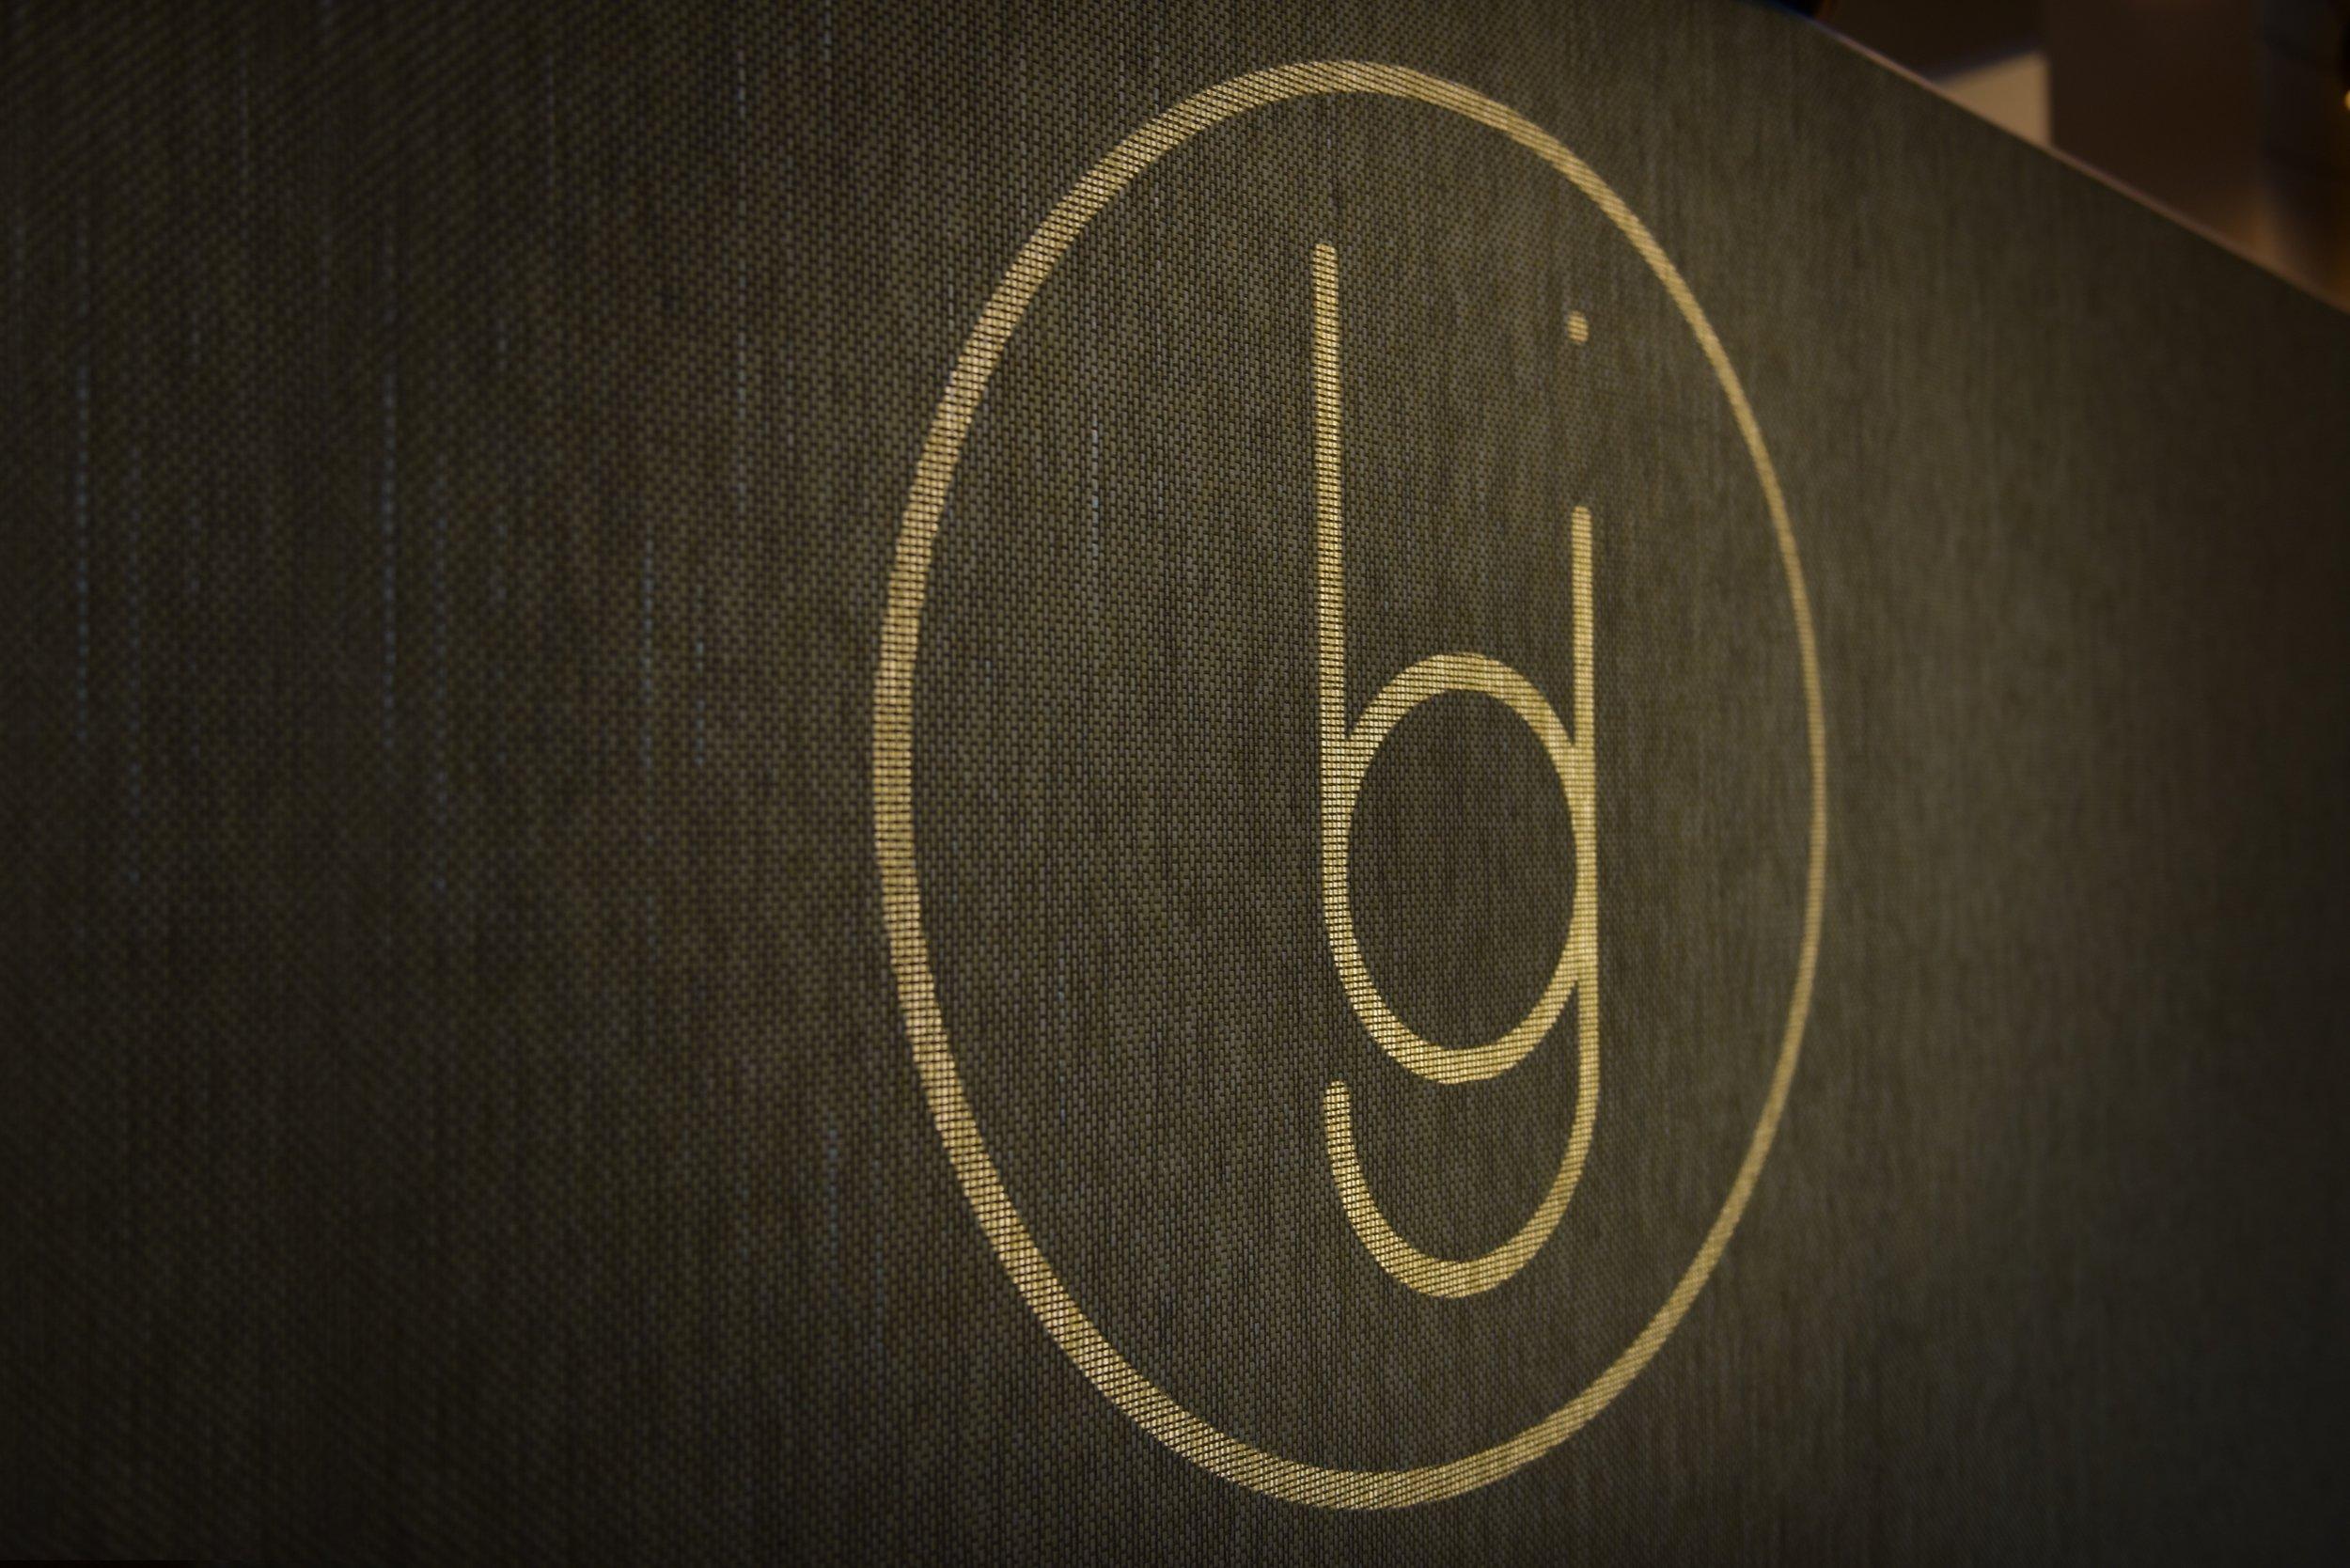 10 brasserie juste restaurant Dikkelvenne tablefever bart albrecht culinair fotograaf foodfotograaf.jpg